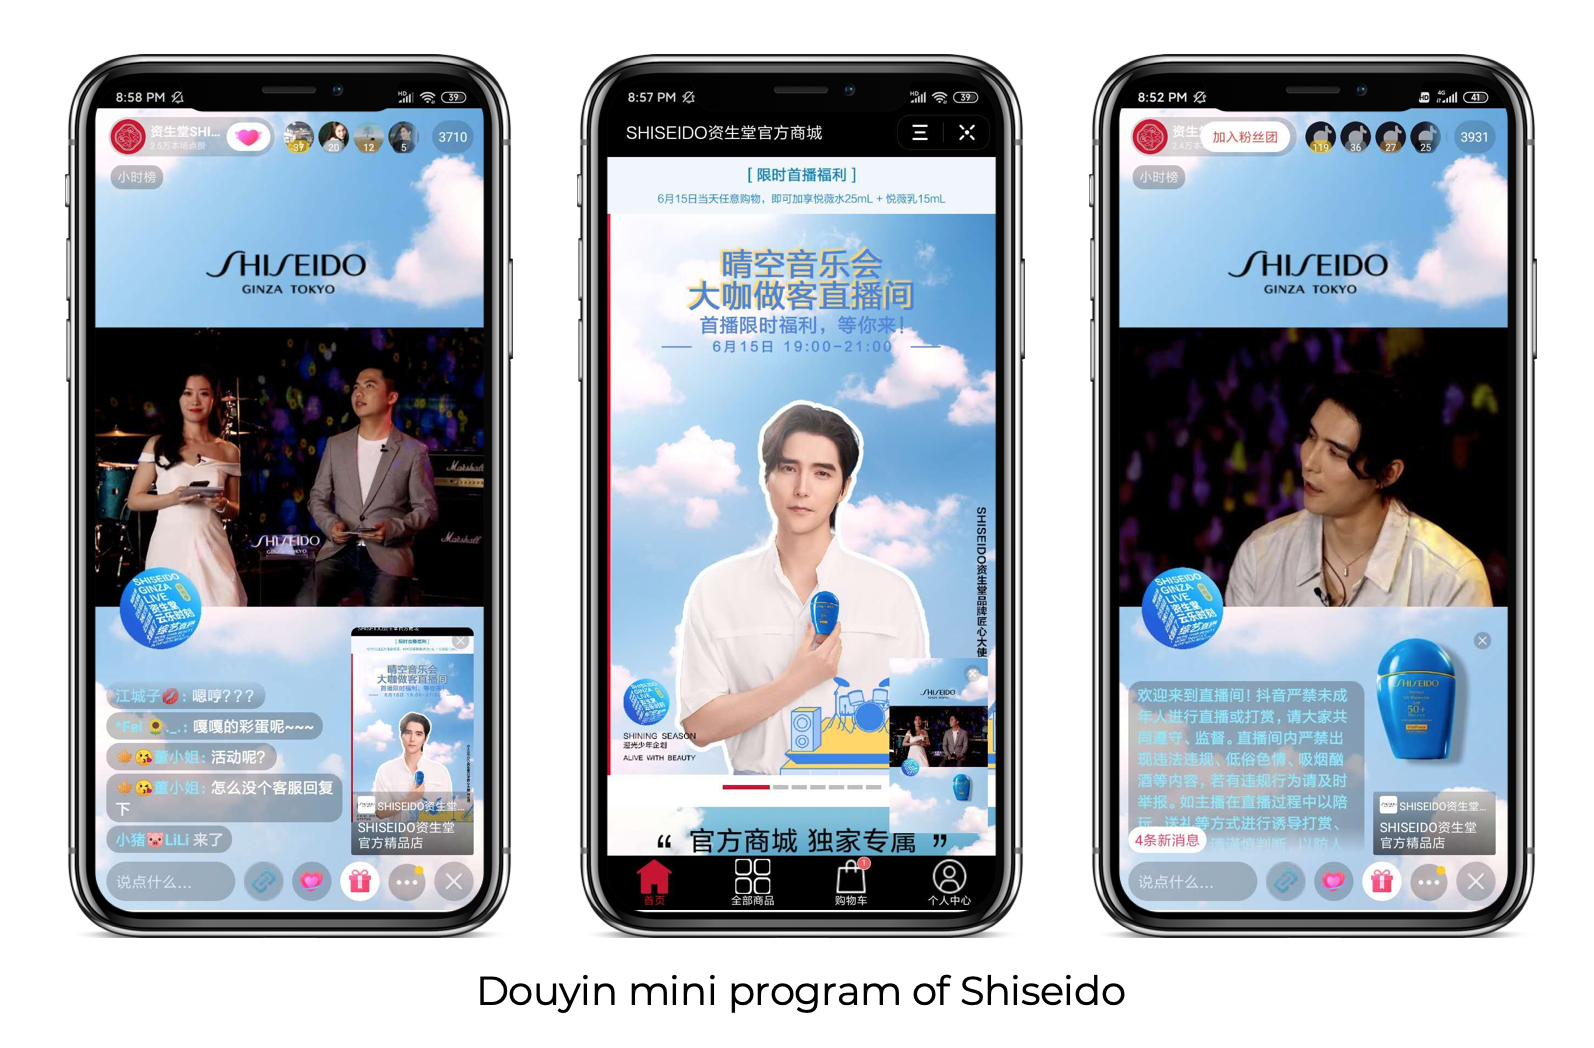 Shiseido Douyin e-commerce examples